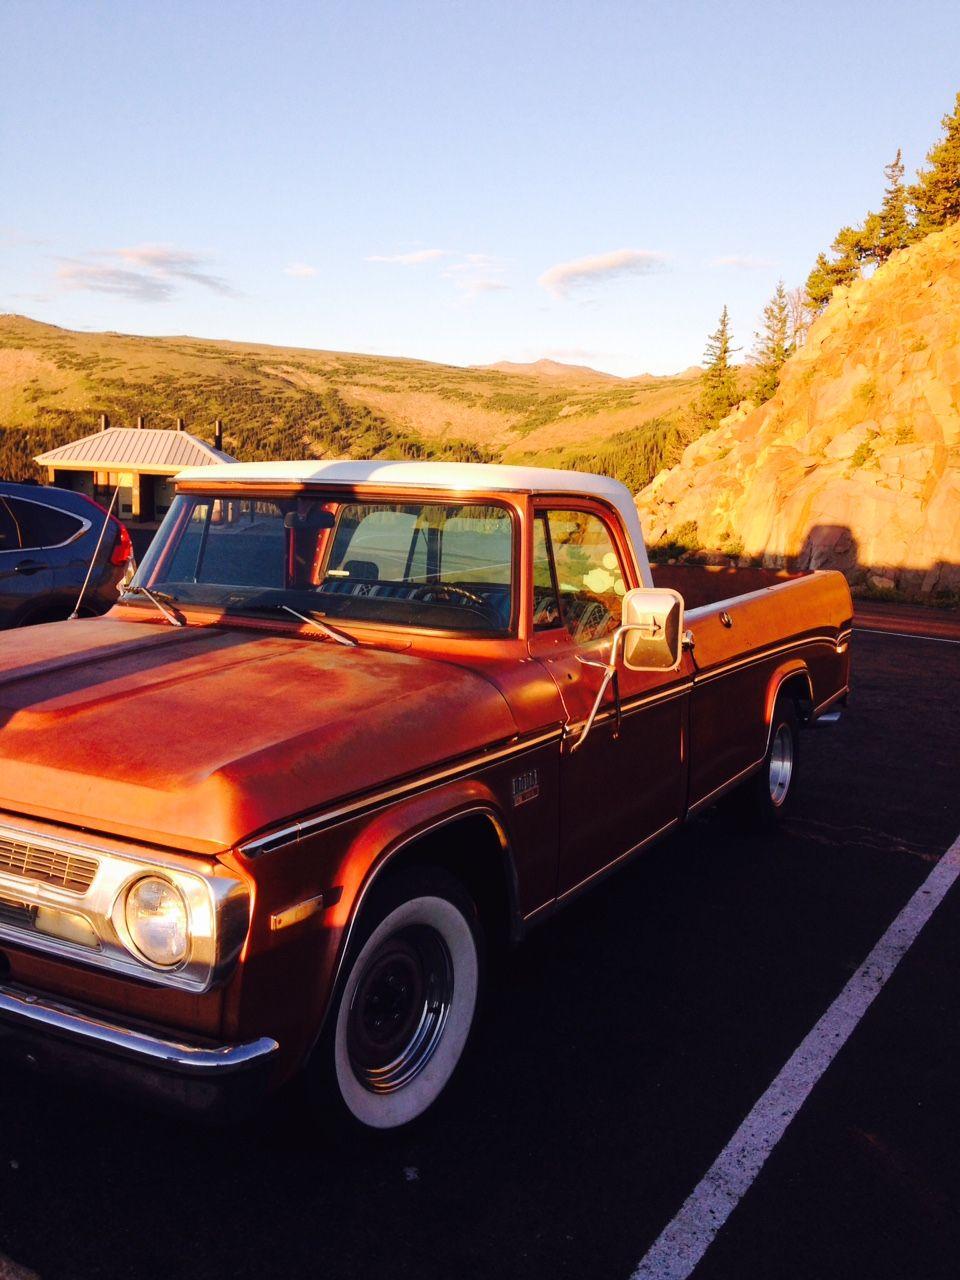 1970 Dodge Charger Rt: 1970 Dodge Sweptline D100, RMNP